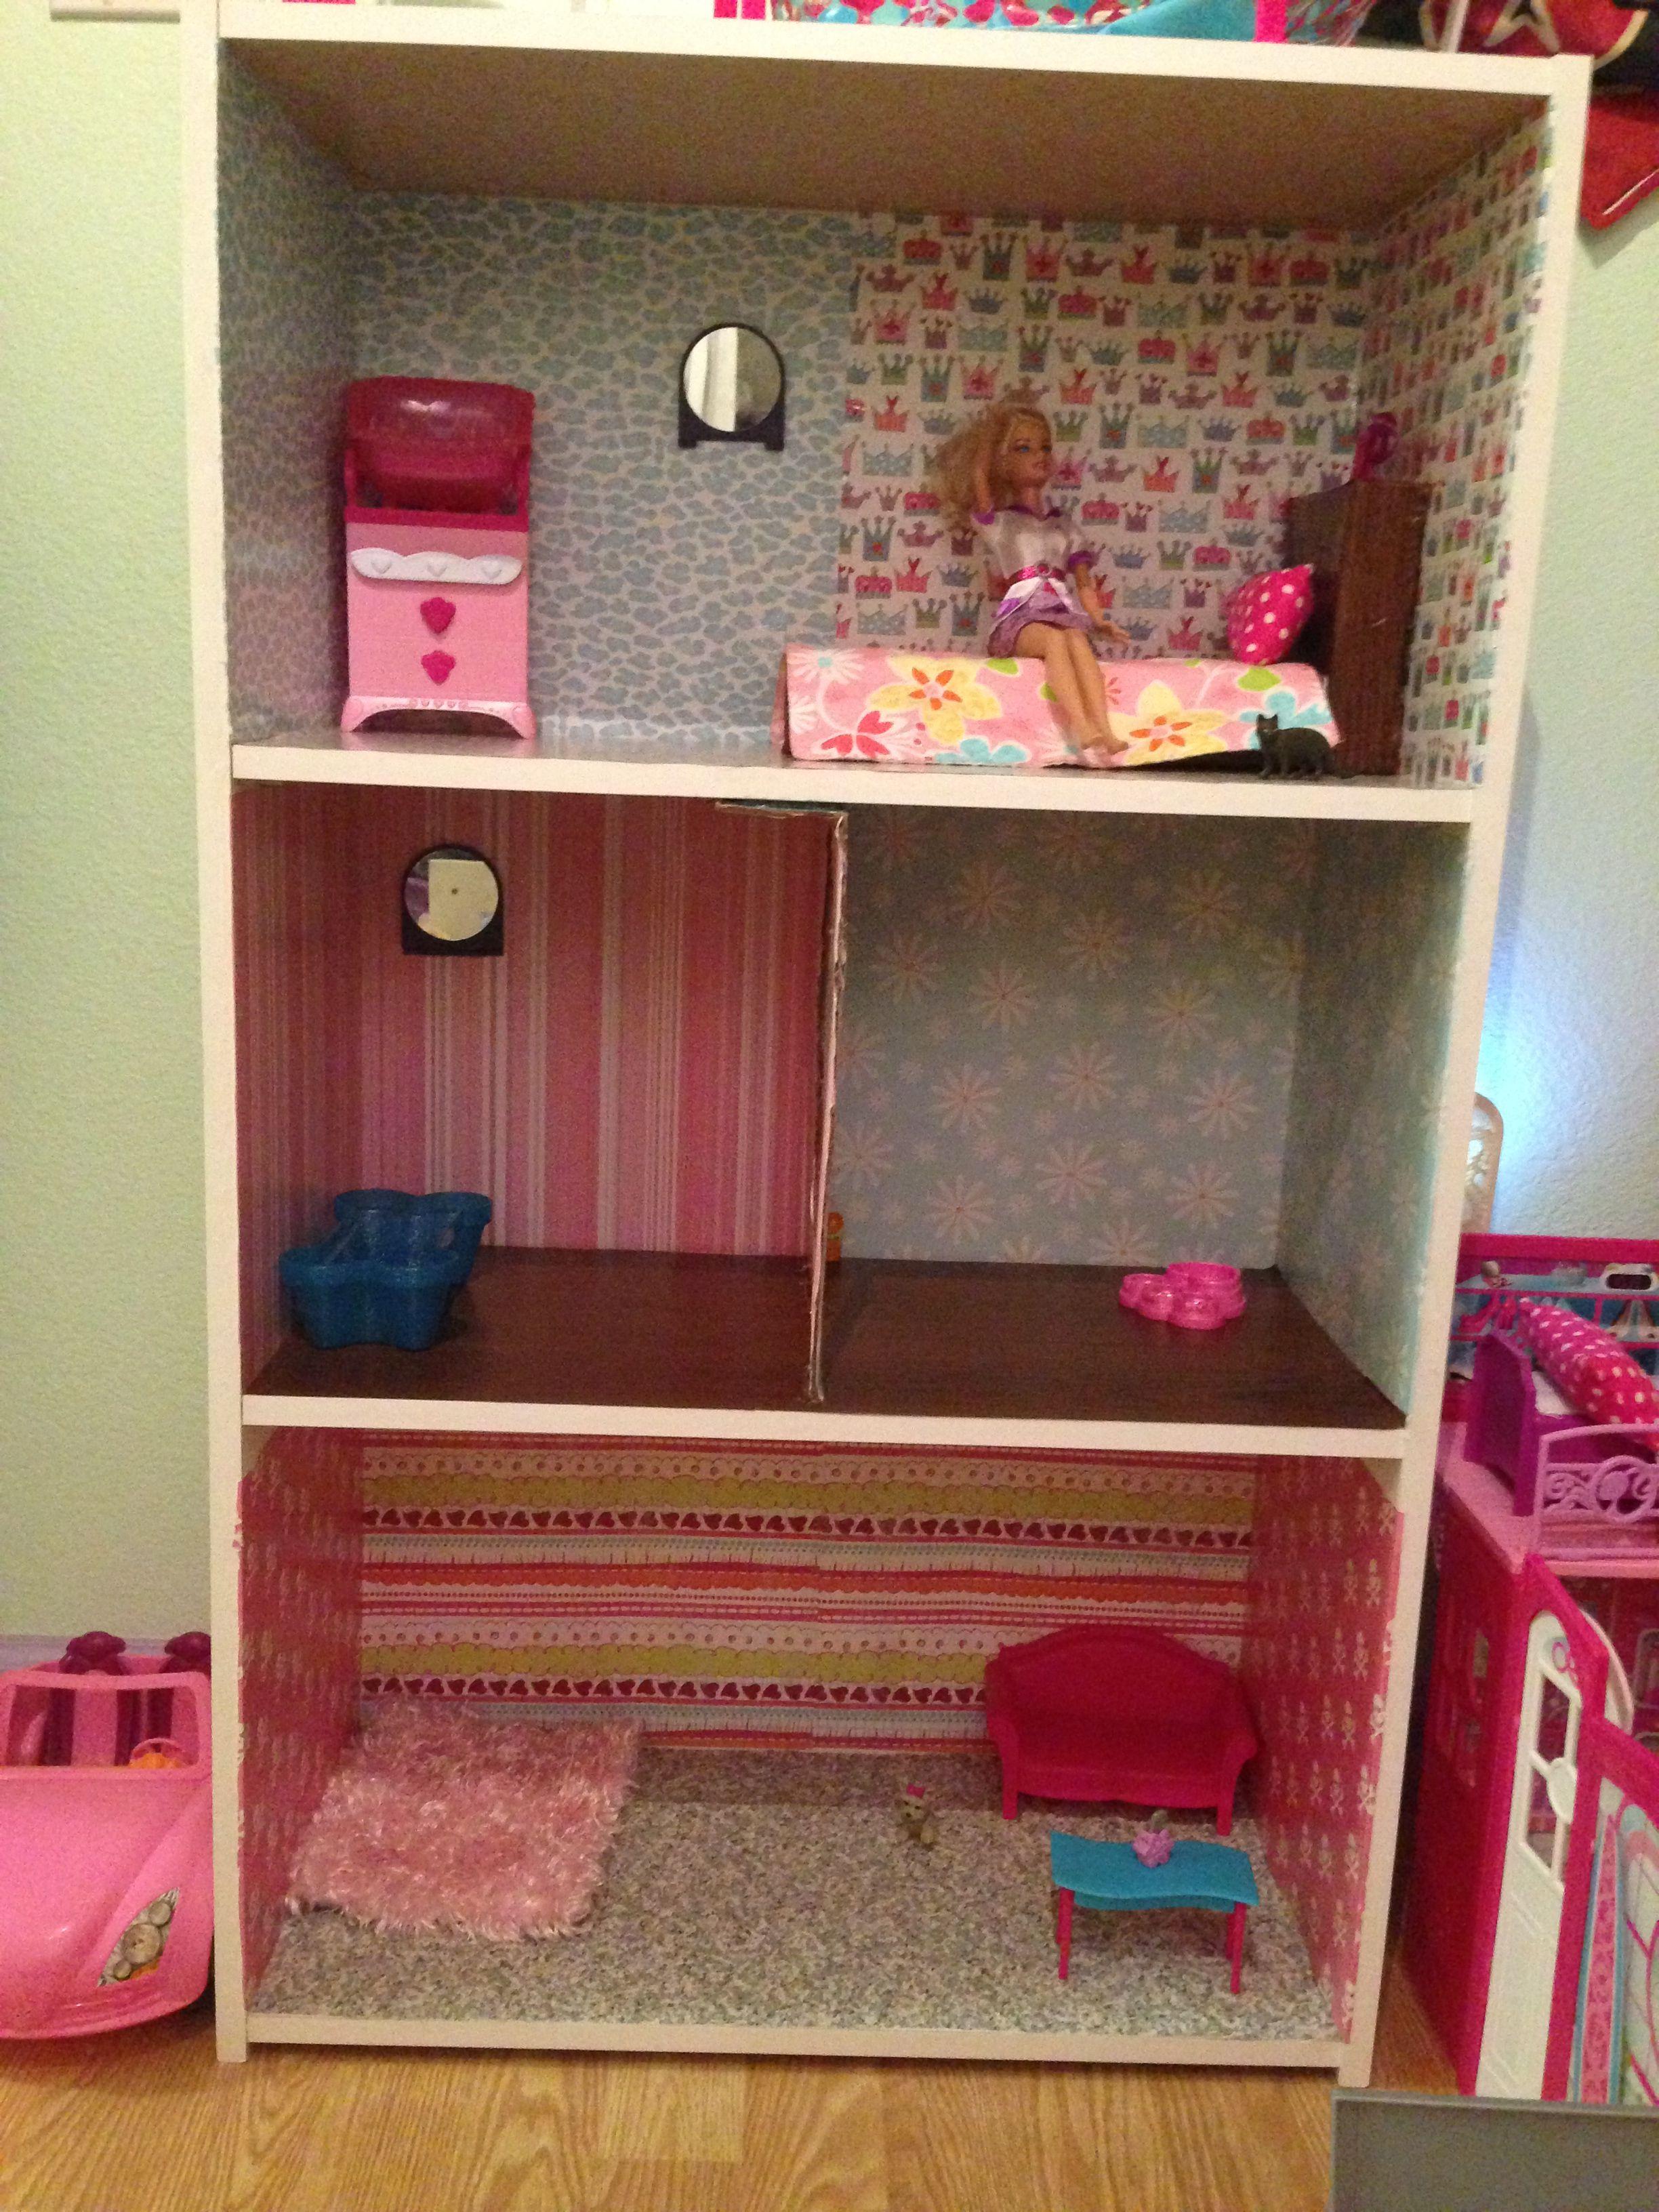 DIY Barbie House. Bookshelf (Target), scrapbook paper/mod